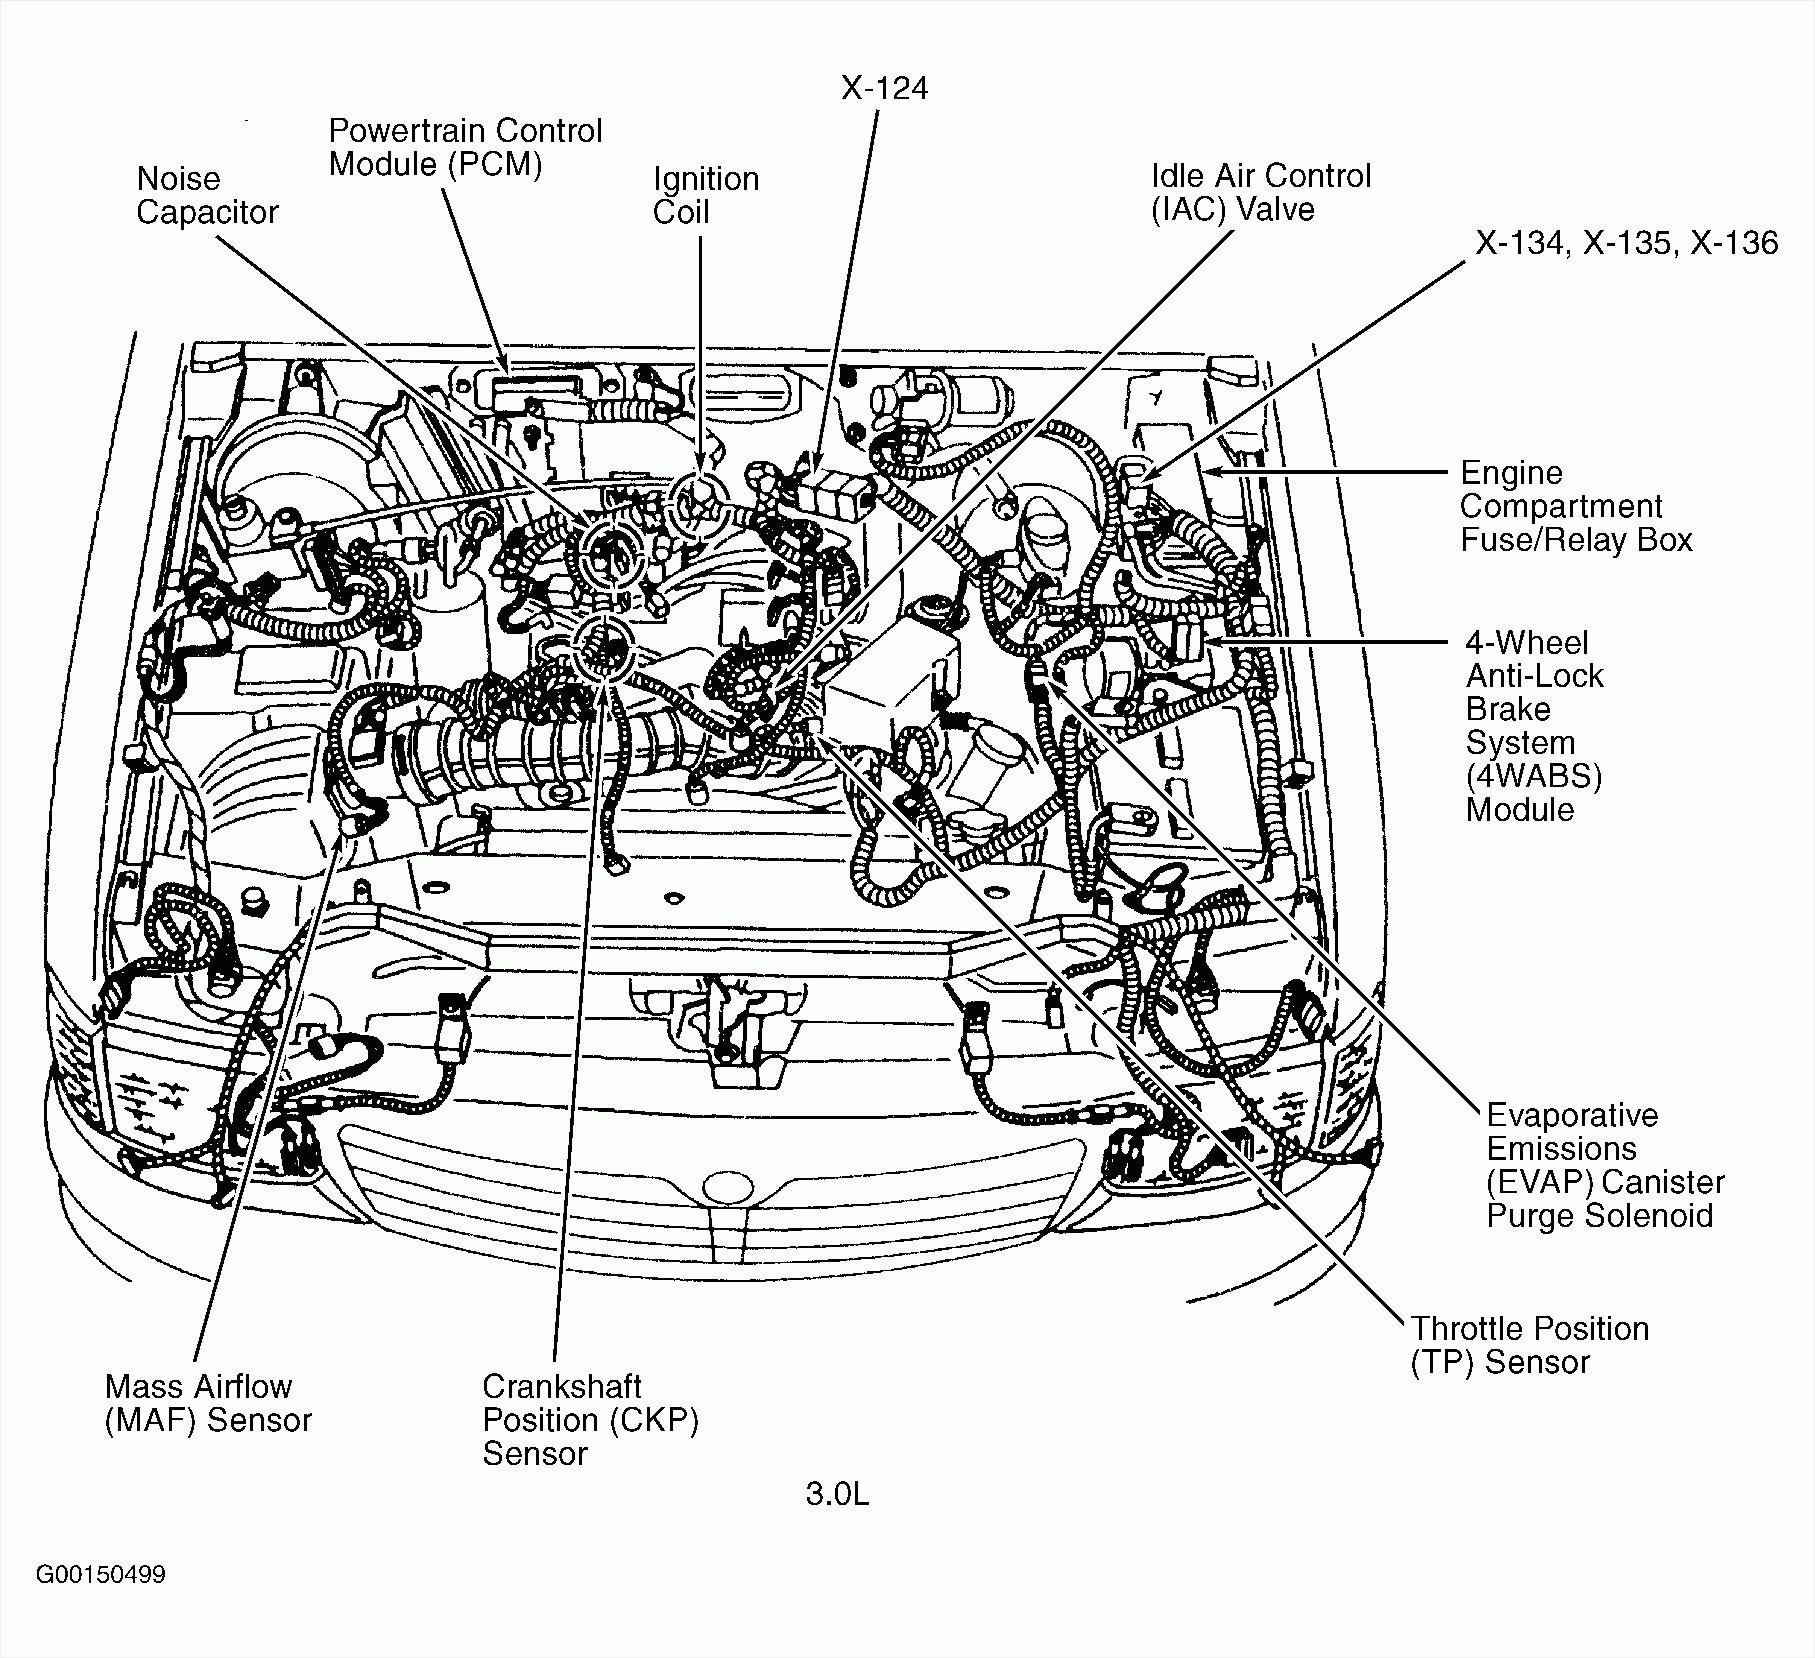 jeep 2 7l engine diagram wiring diagram dash toyota 3rz motor toyota 2 7l engine diagram #4